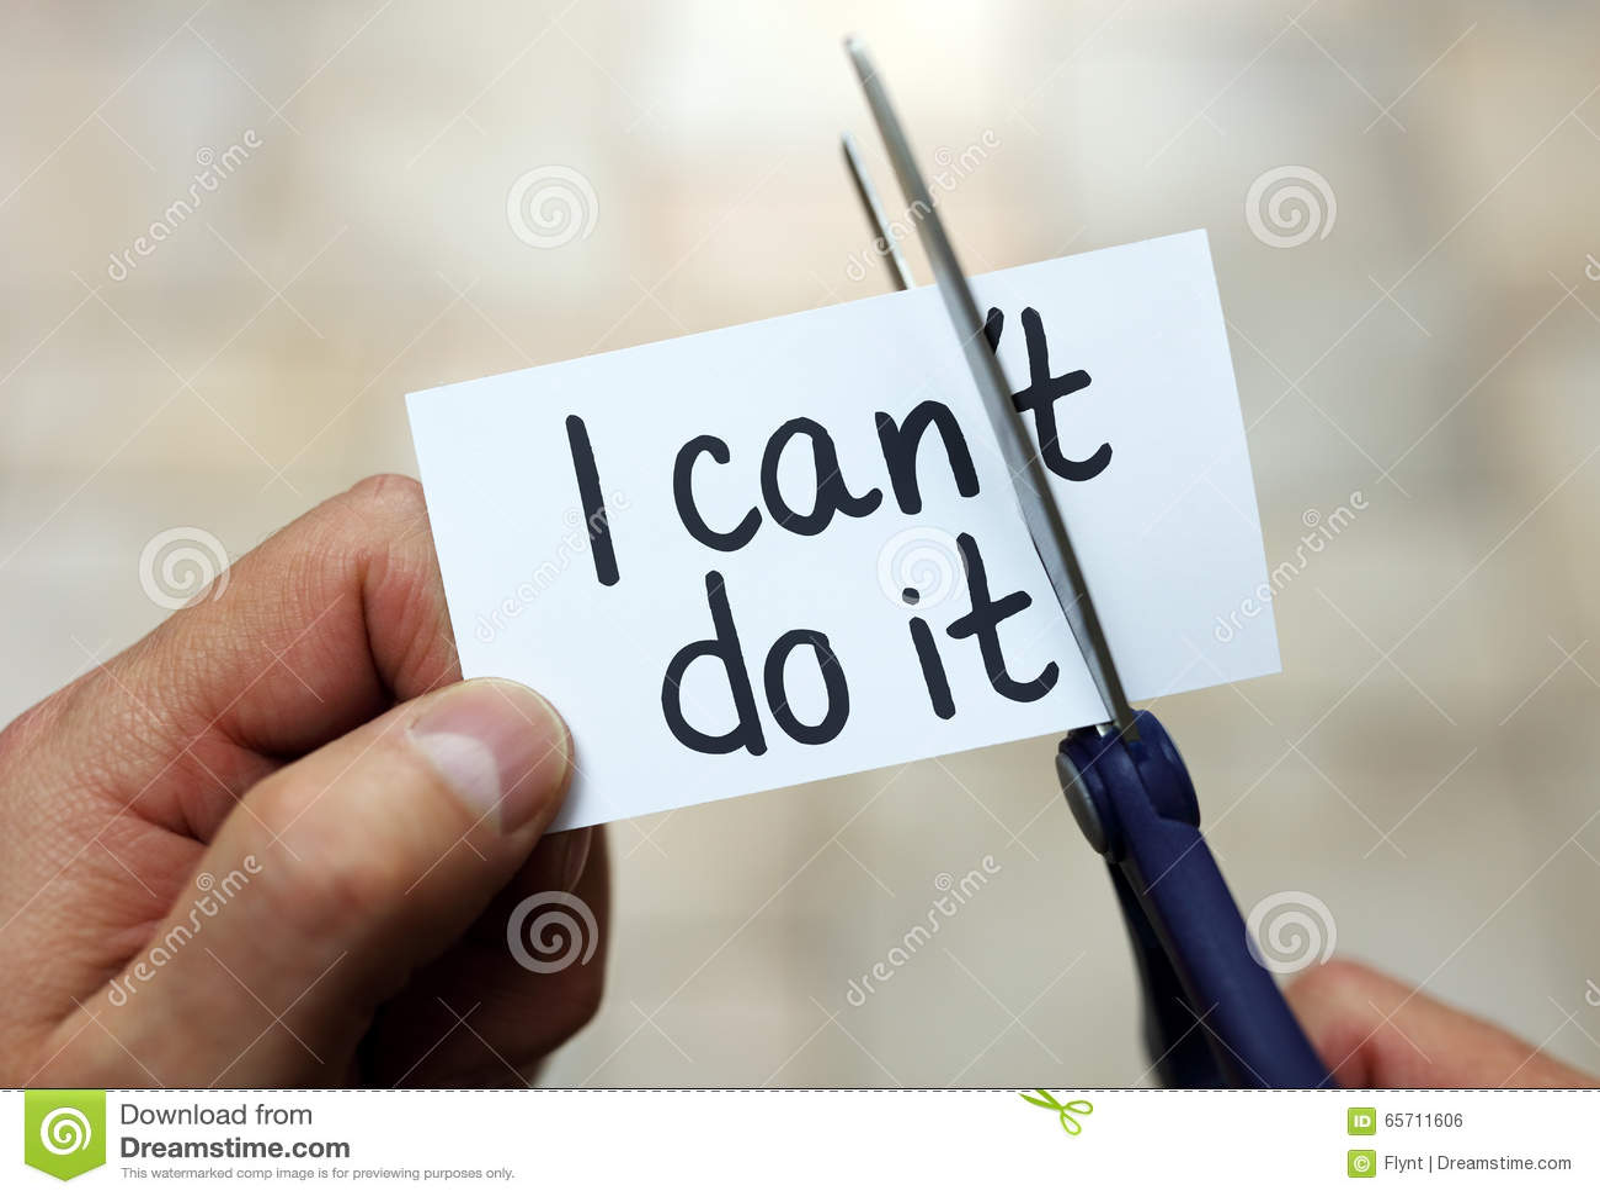 i can do it stock photo image of attitude motivation 65711606